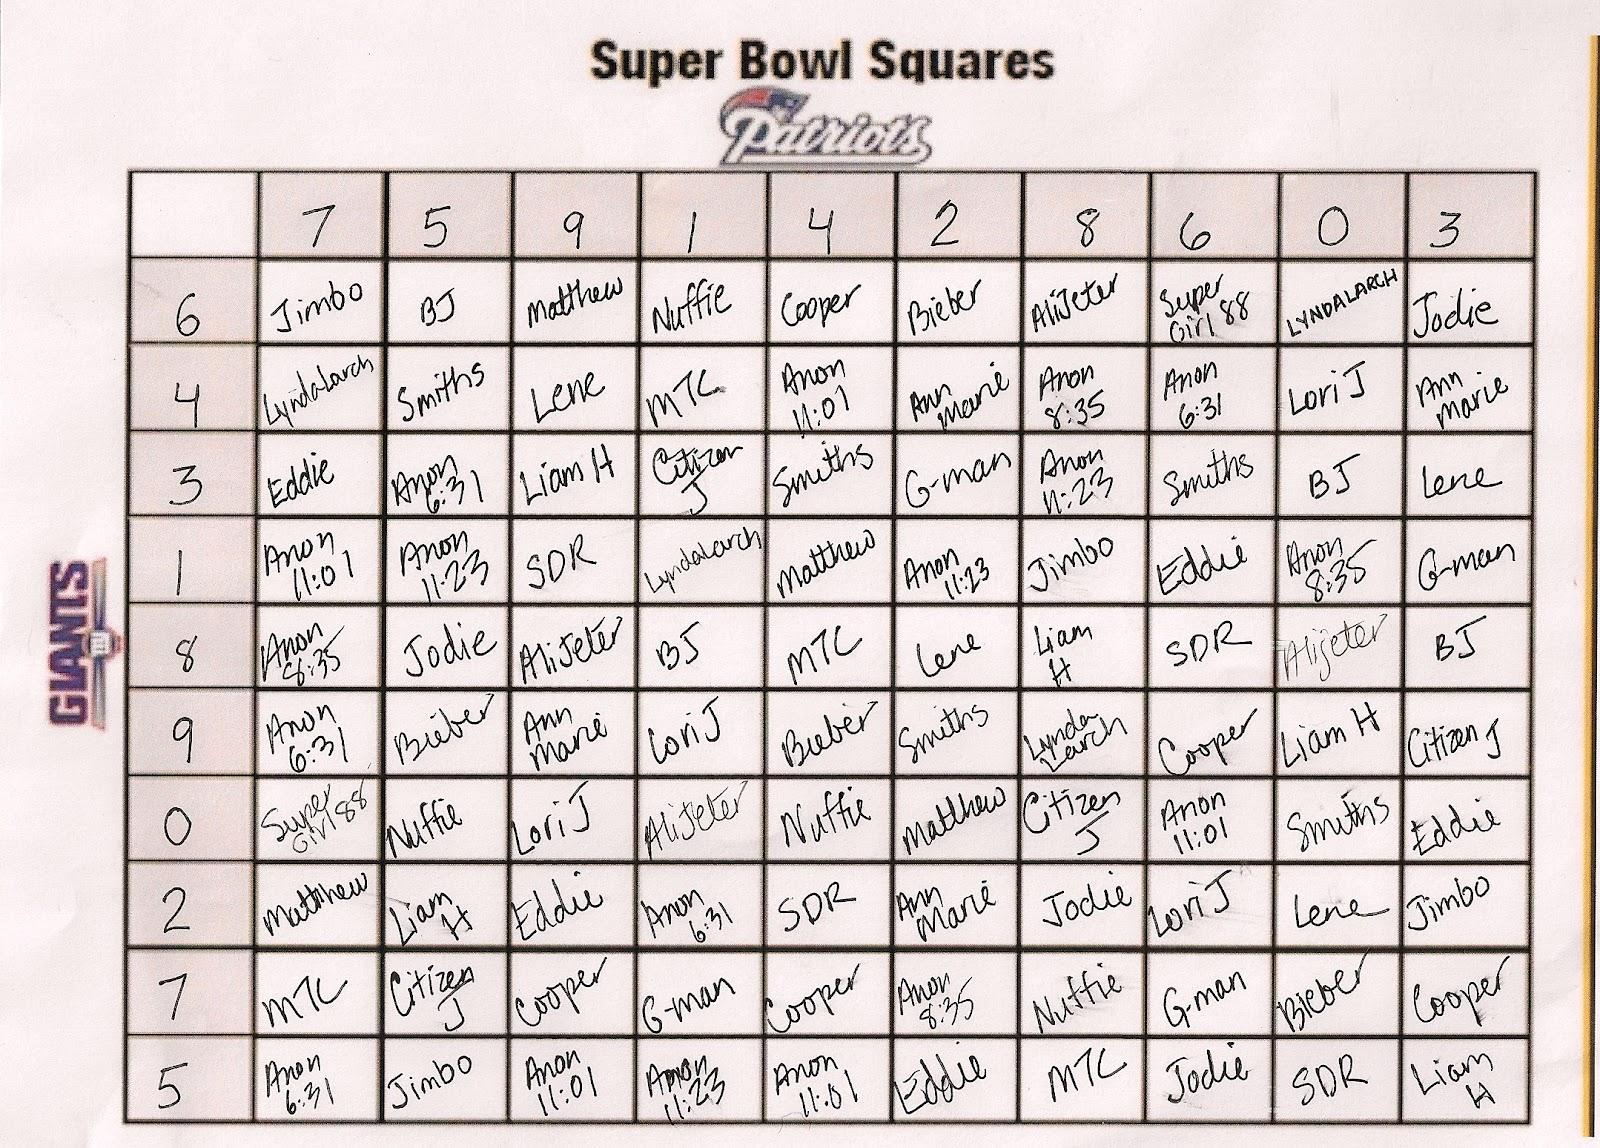 Super Bowl Squares Game Grid   Super Bowl Squares 2016